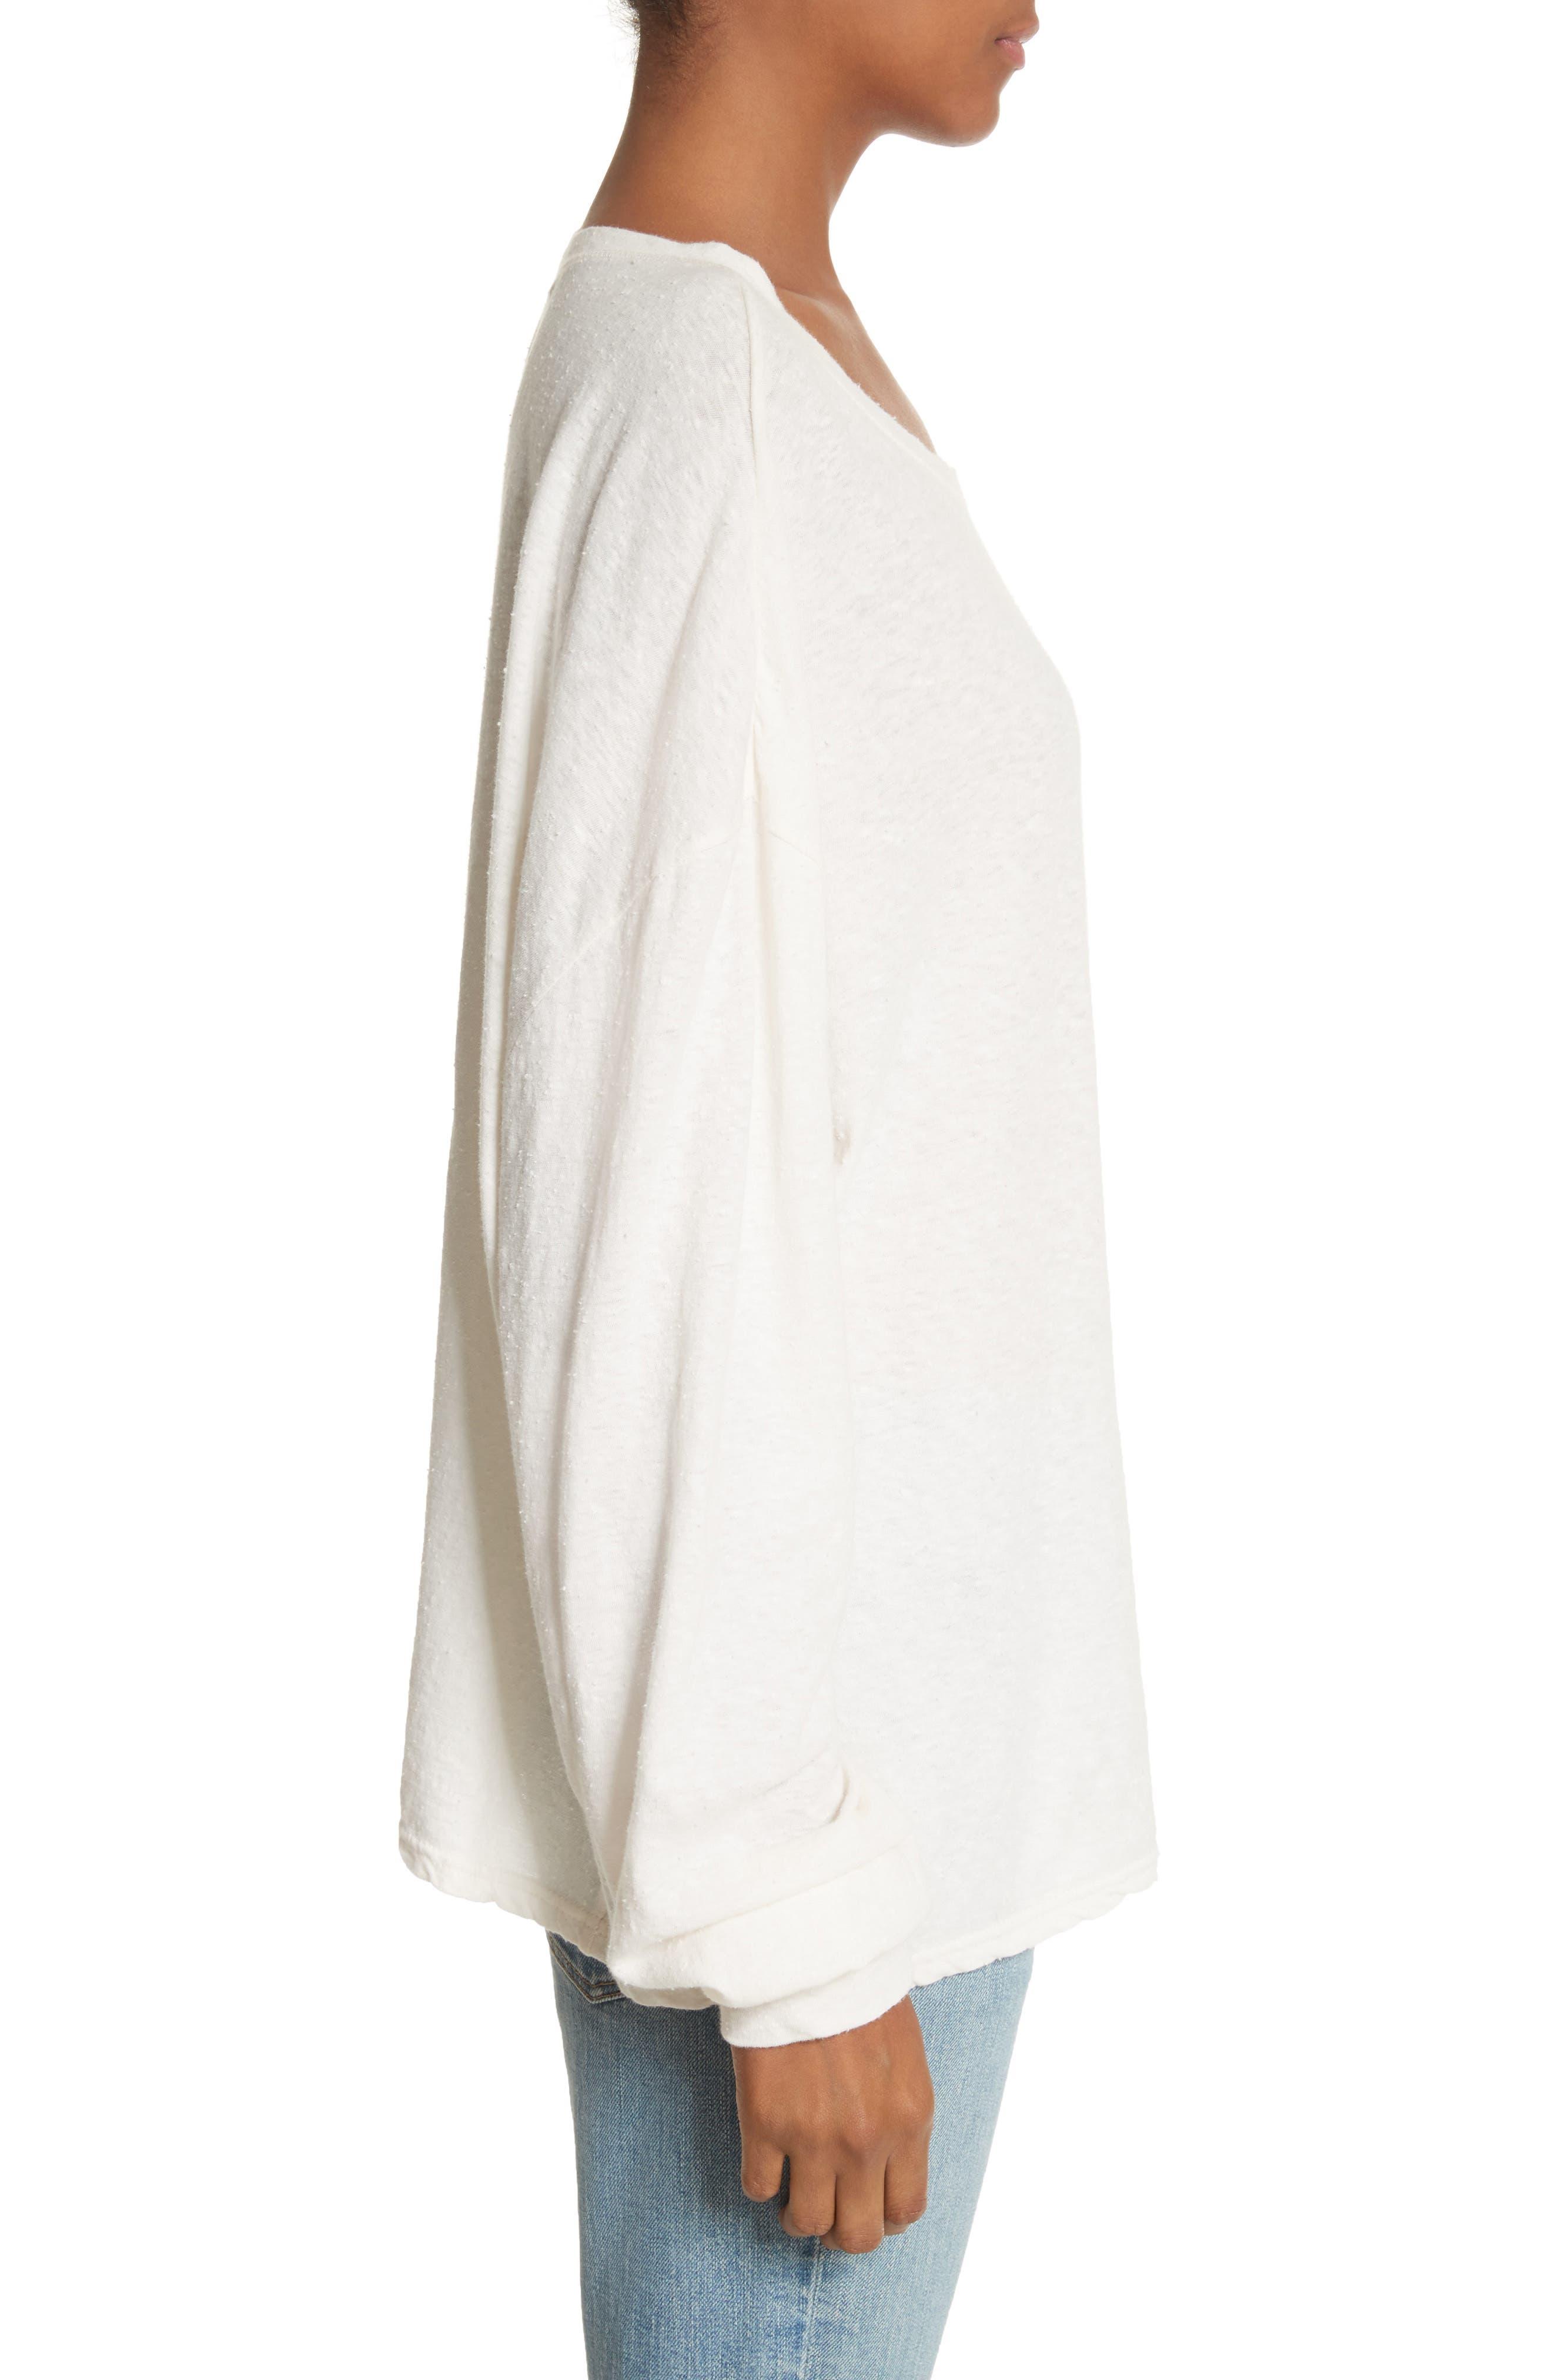 Solano Oversize Cotton Top,                             Alternate thumbnail 3, color,                             White